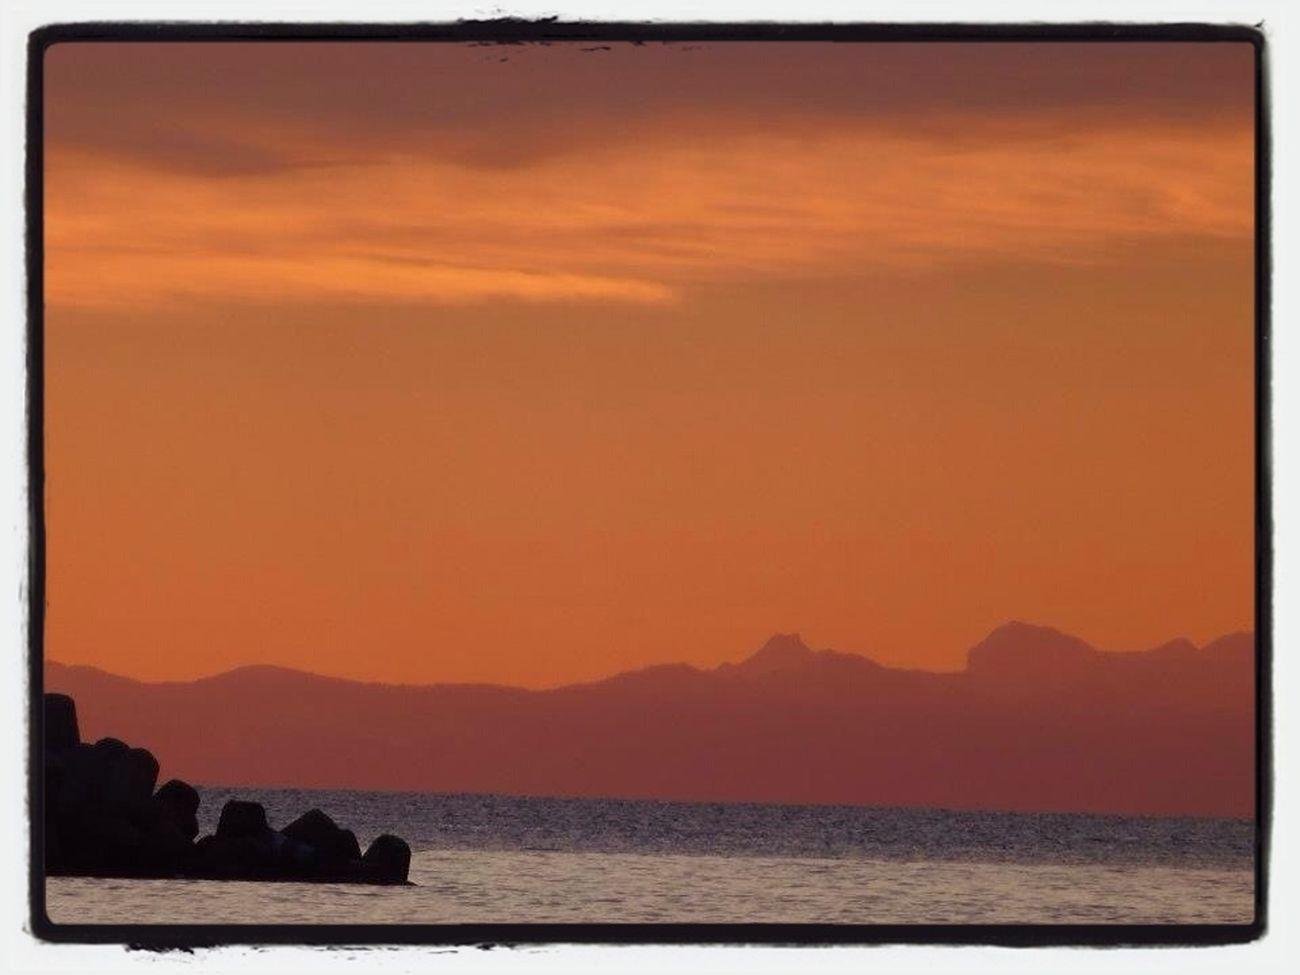 Sea_in_liguria